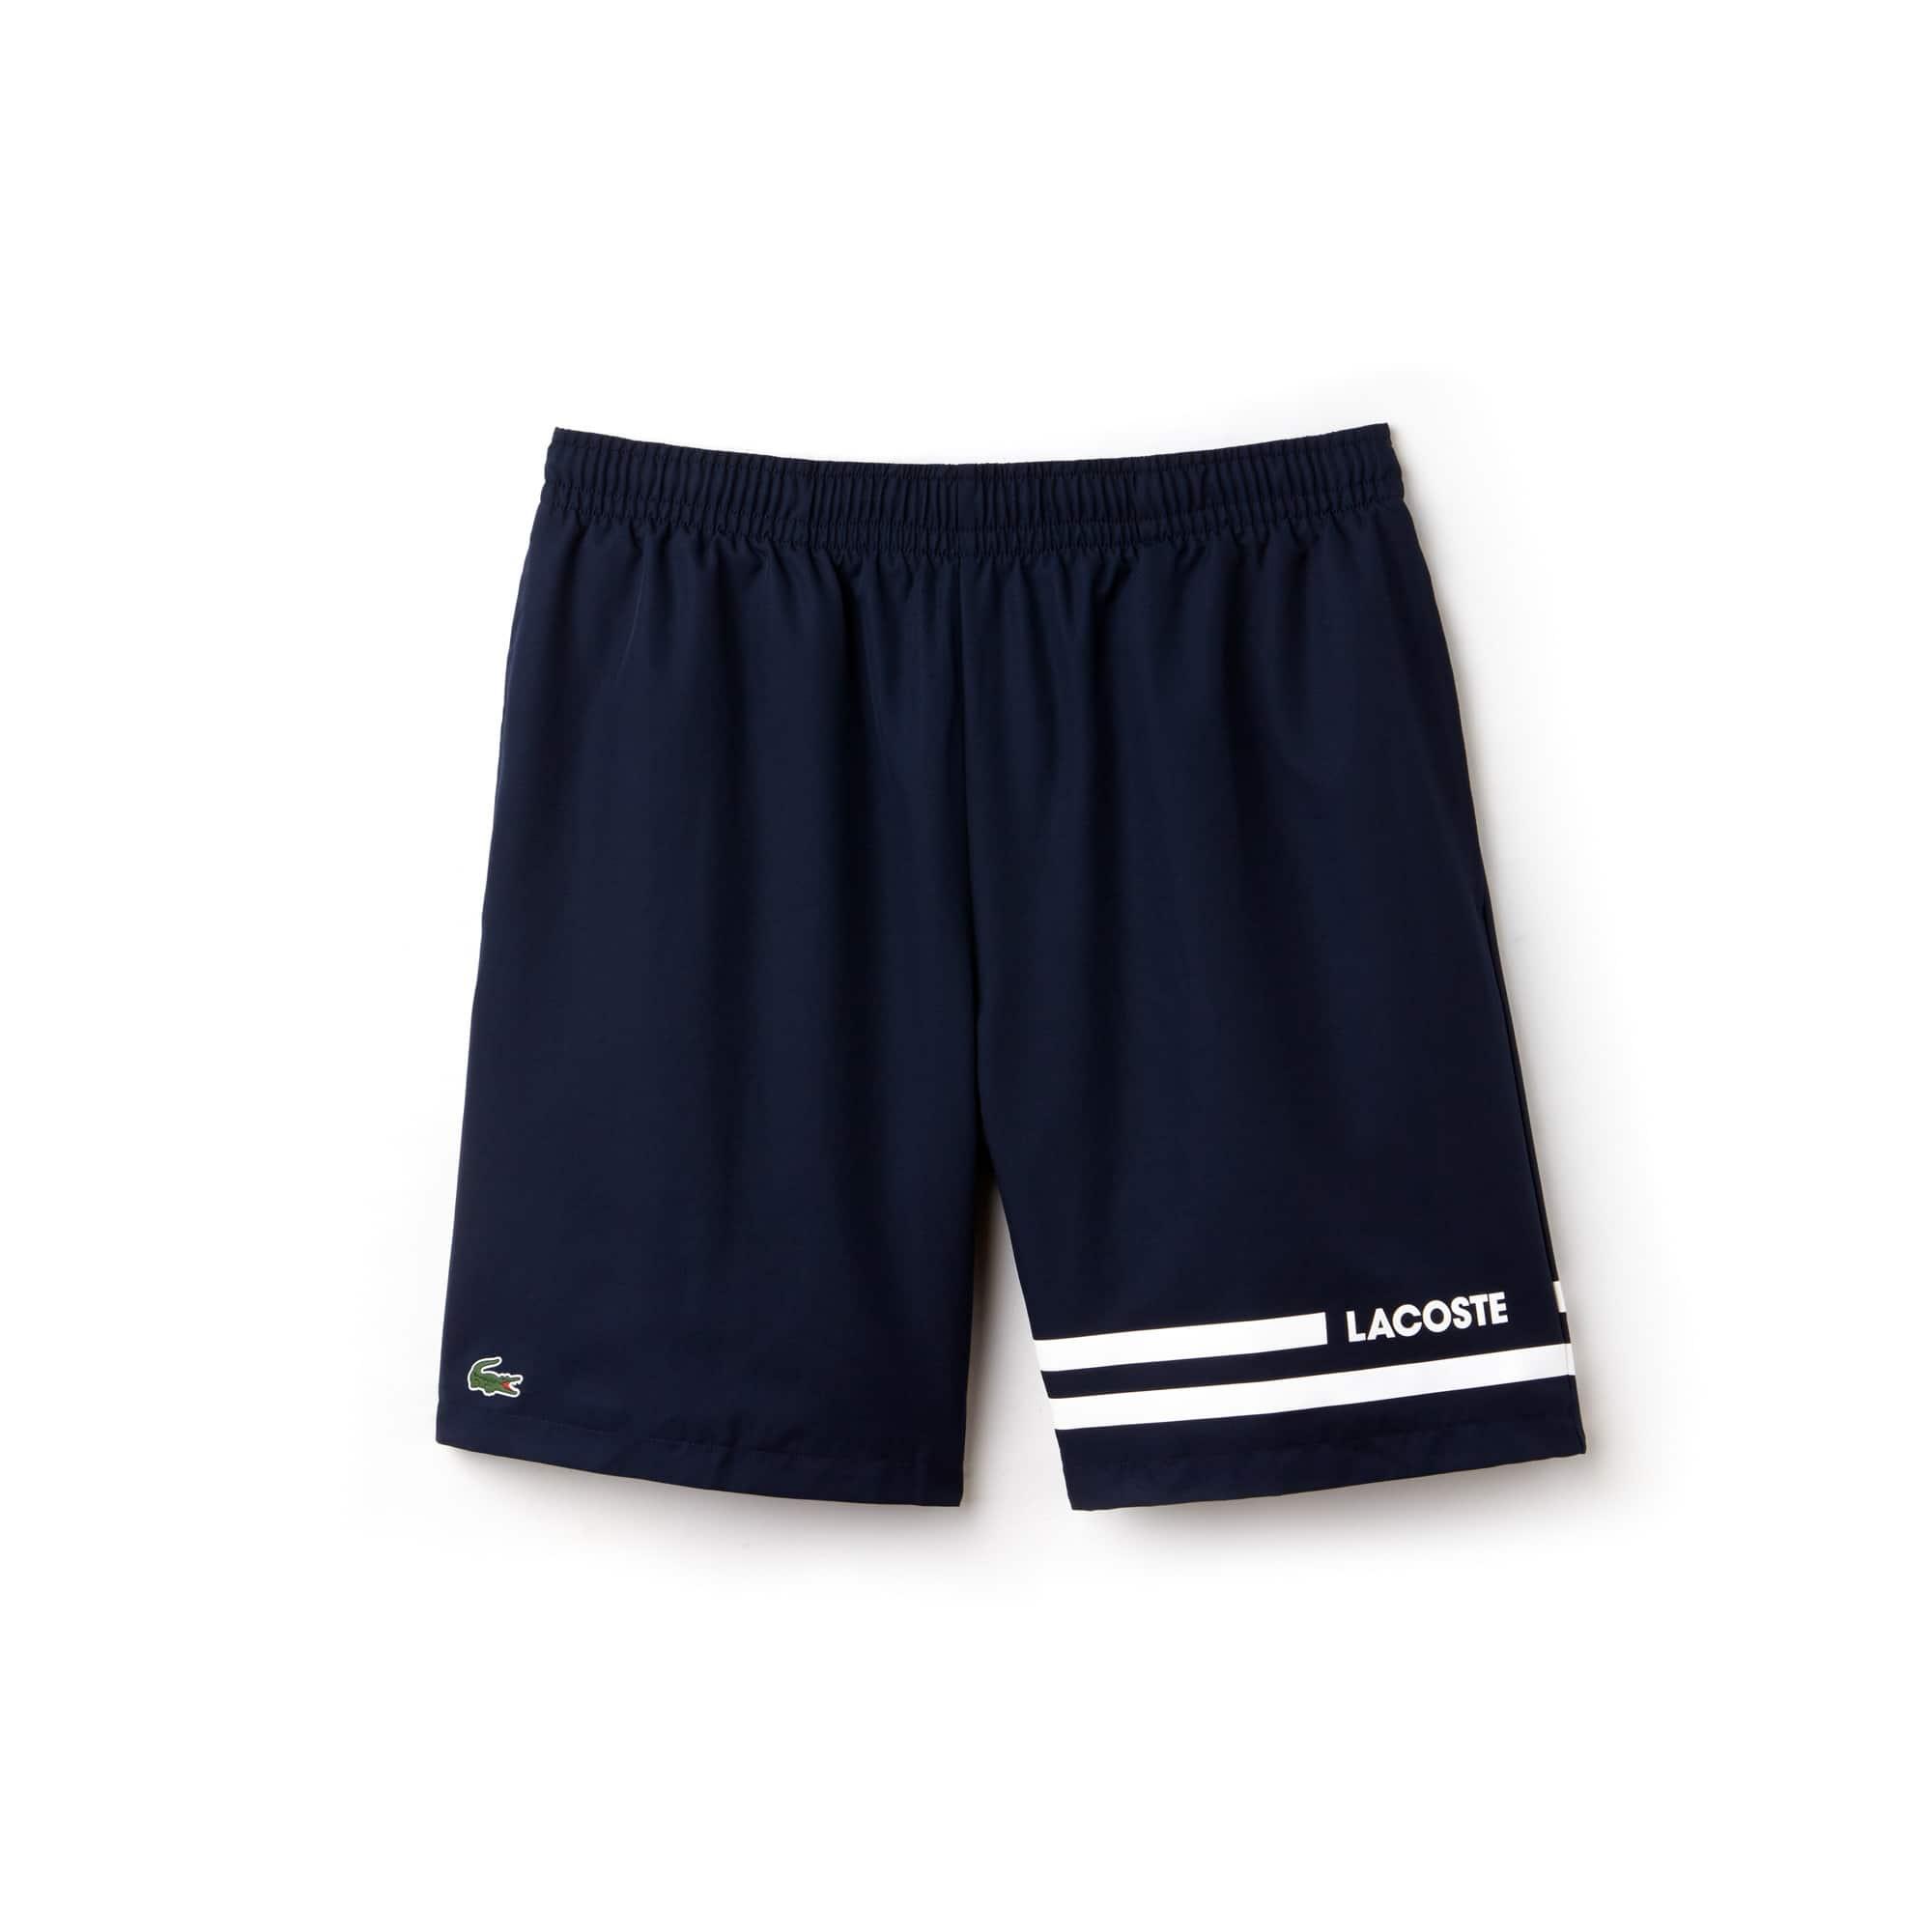 Men's SPORT Contrast Tennis Shorts